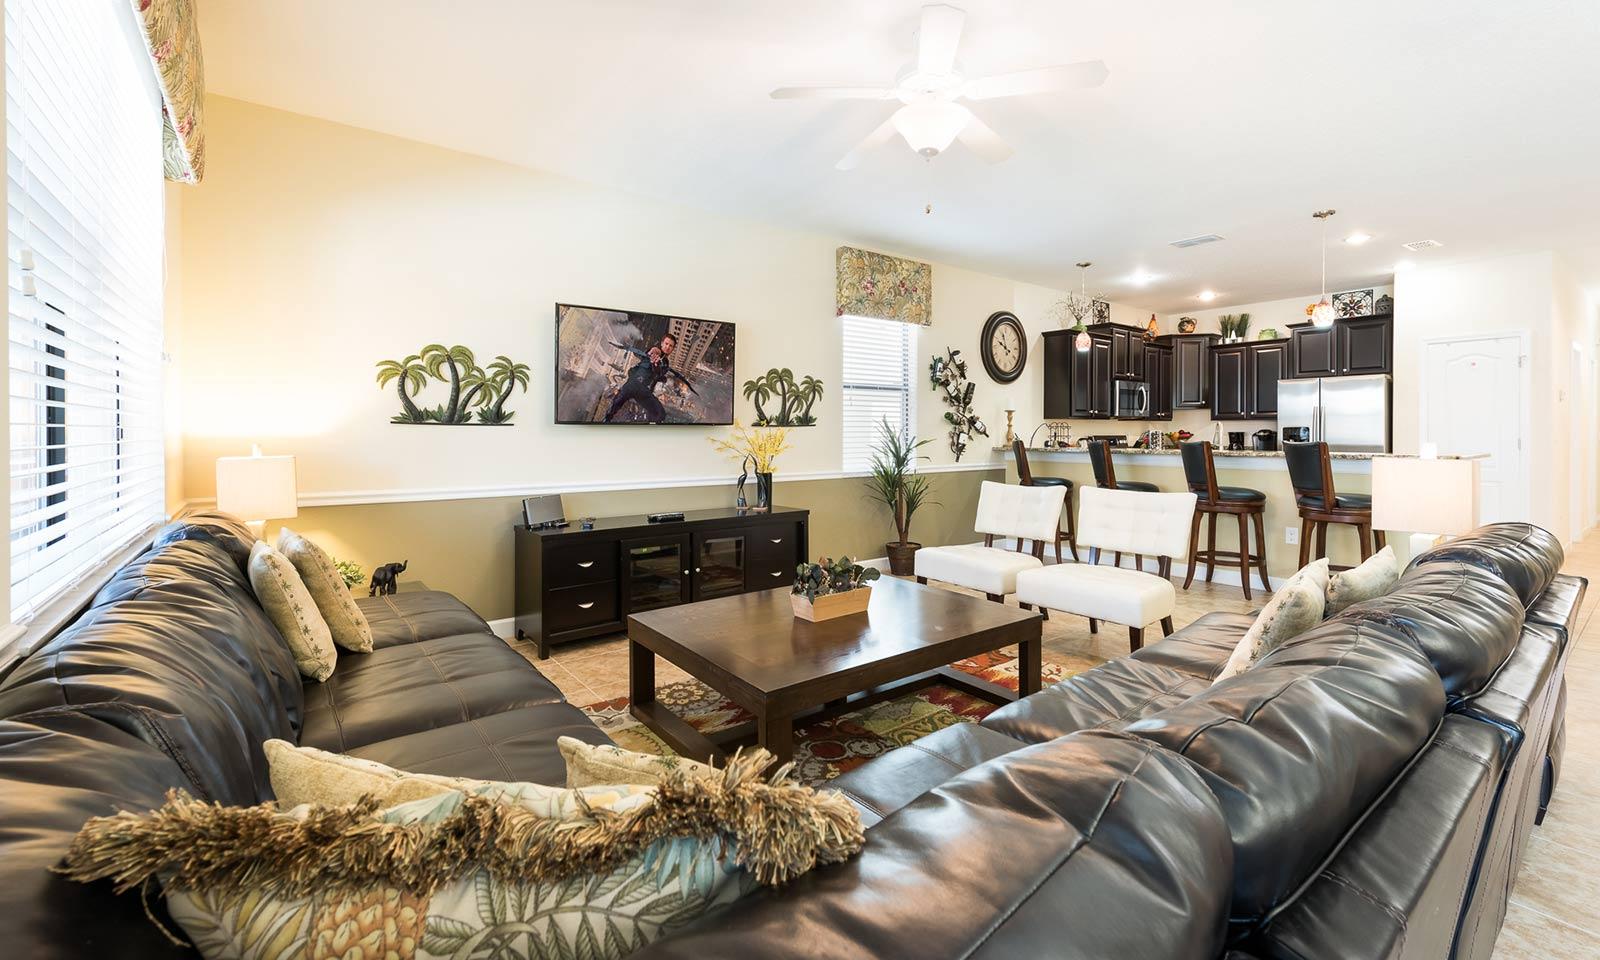 [amenities:living-area:1] Living Area